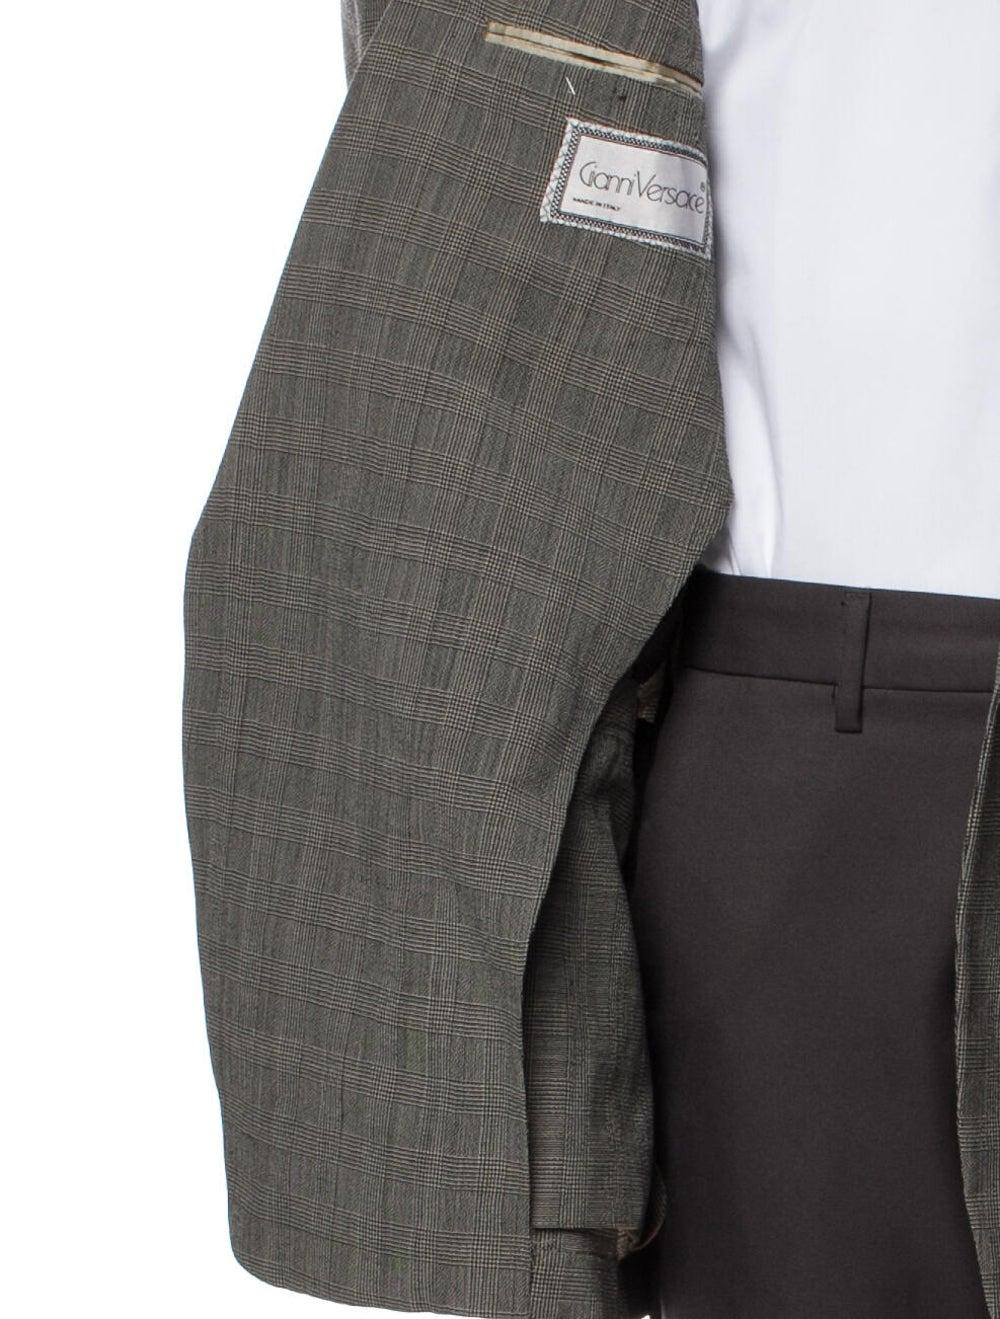 Gianni Versace Blazer - image 4